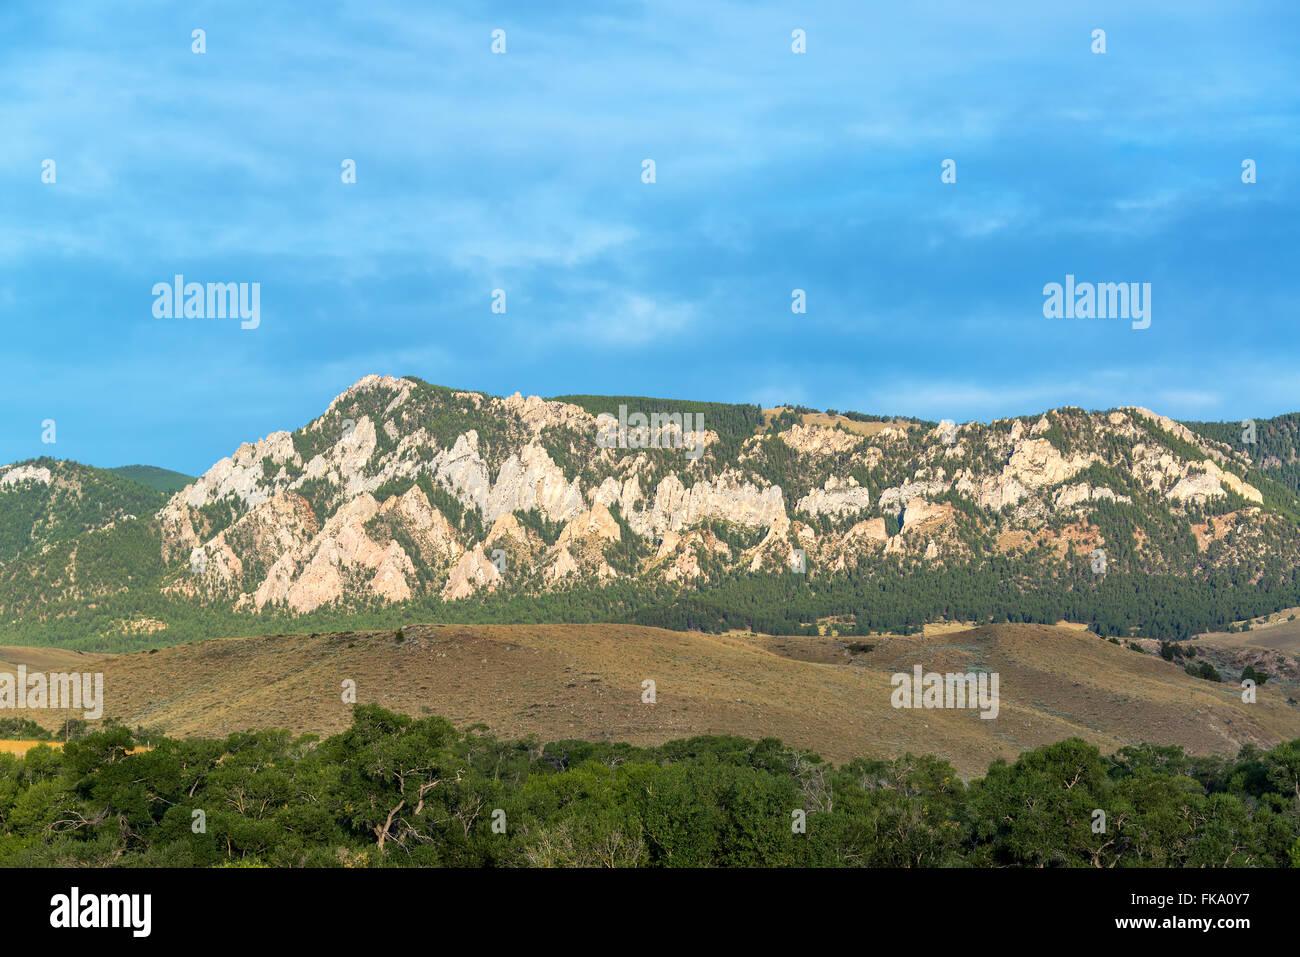 Rugged terrain in the Bighorn Mountain Range near Buffalo, Wyoming - Stock Image